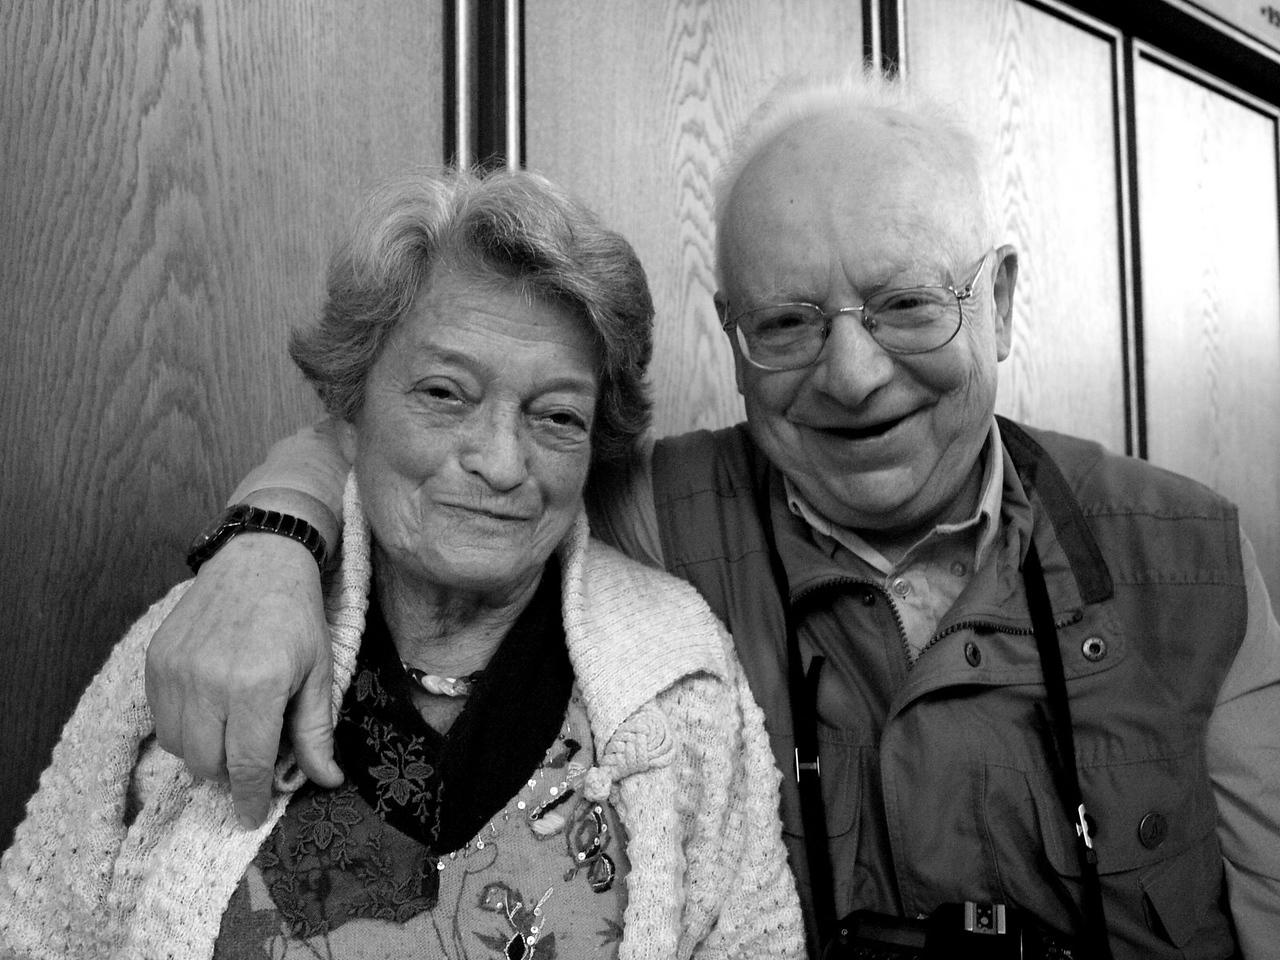 Mr. & Mrs. Sonnenbluck